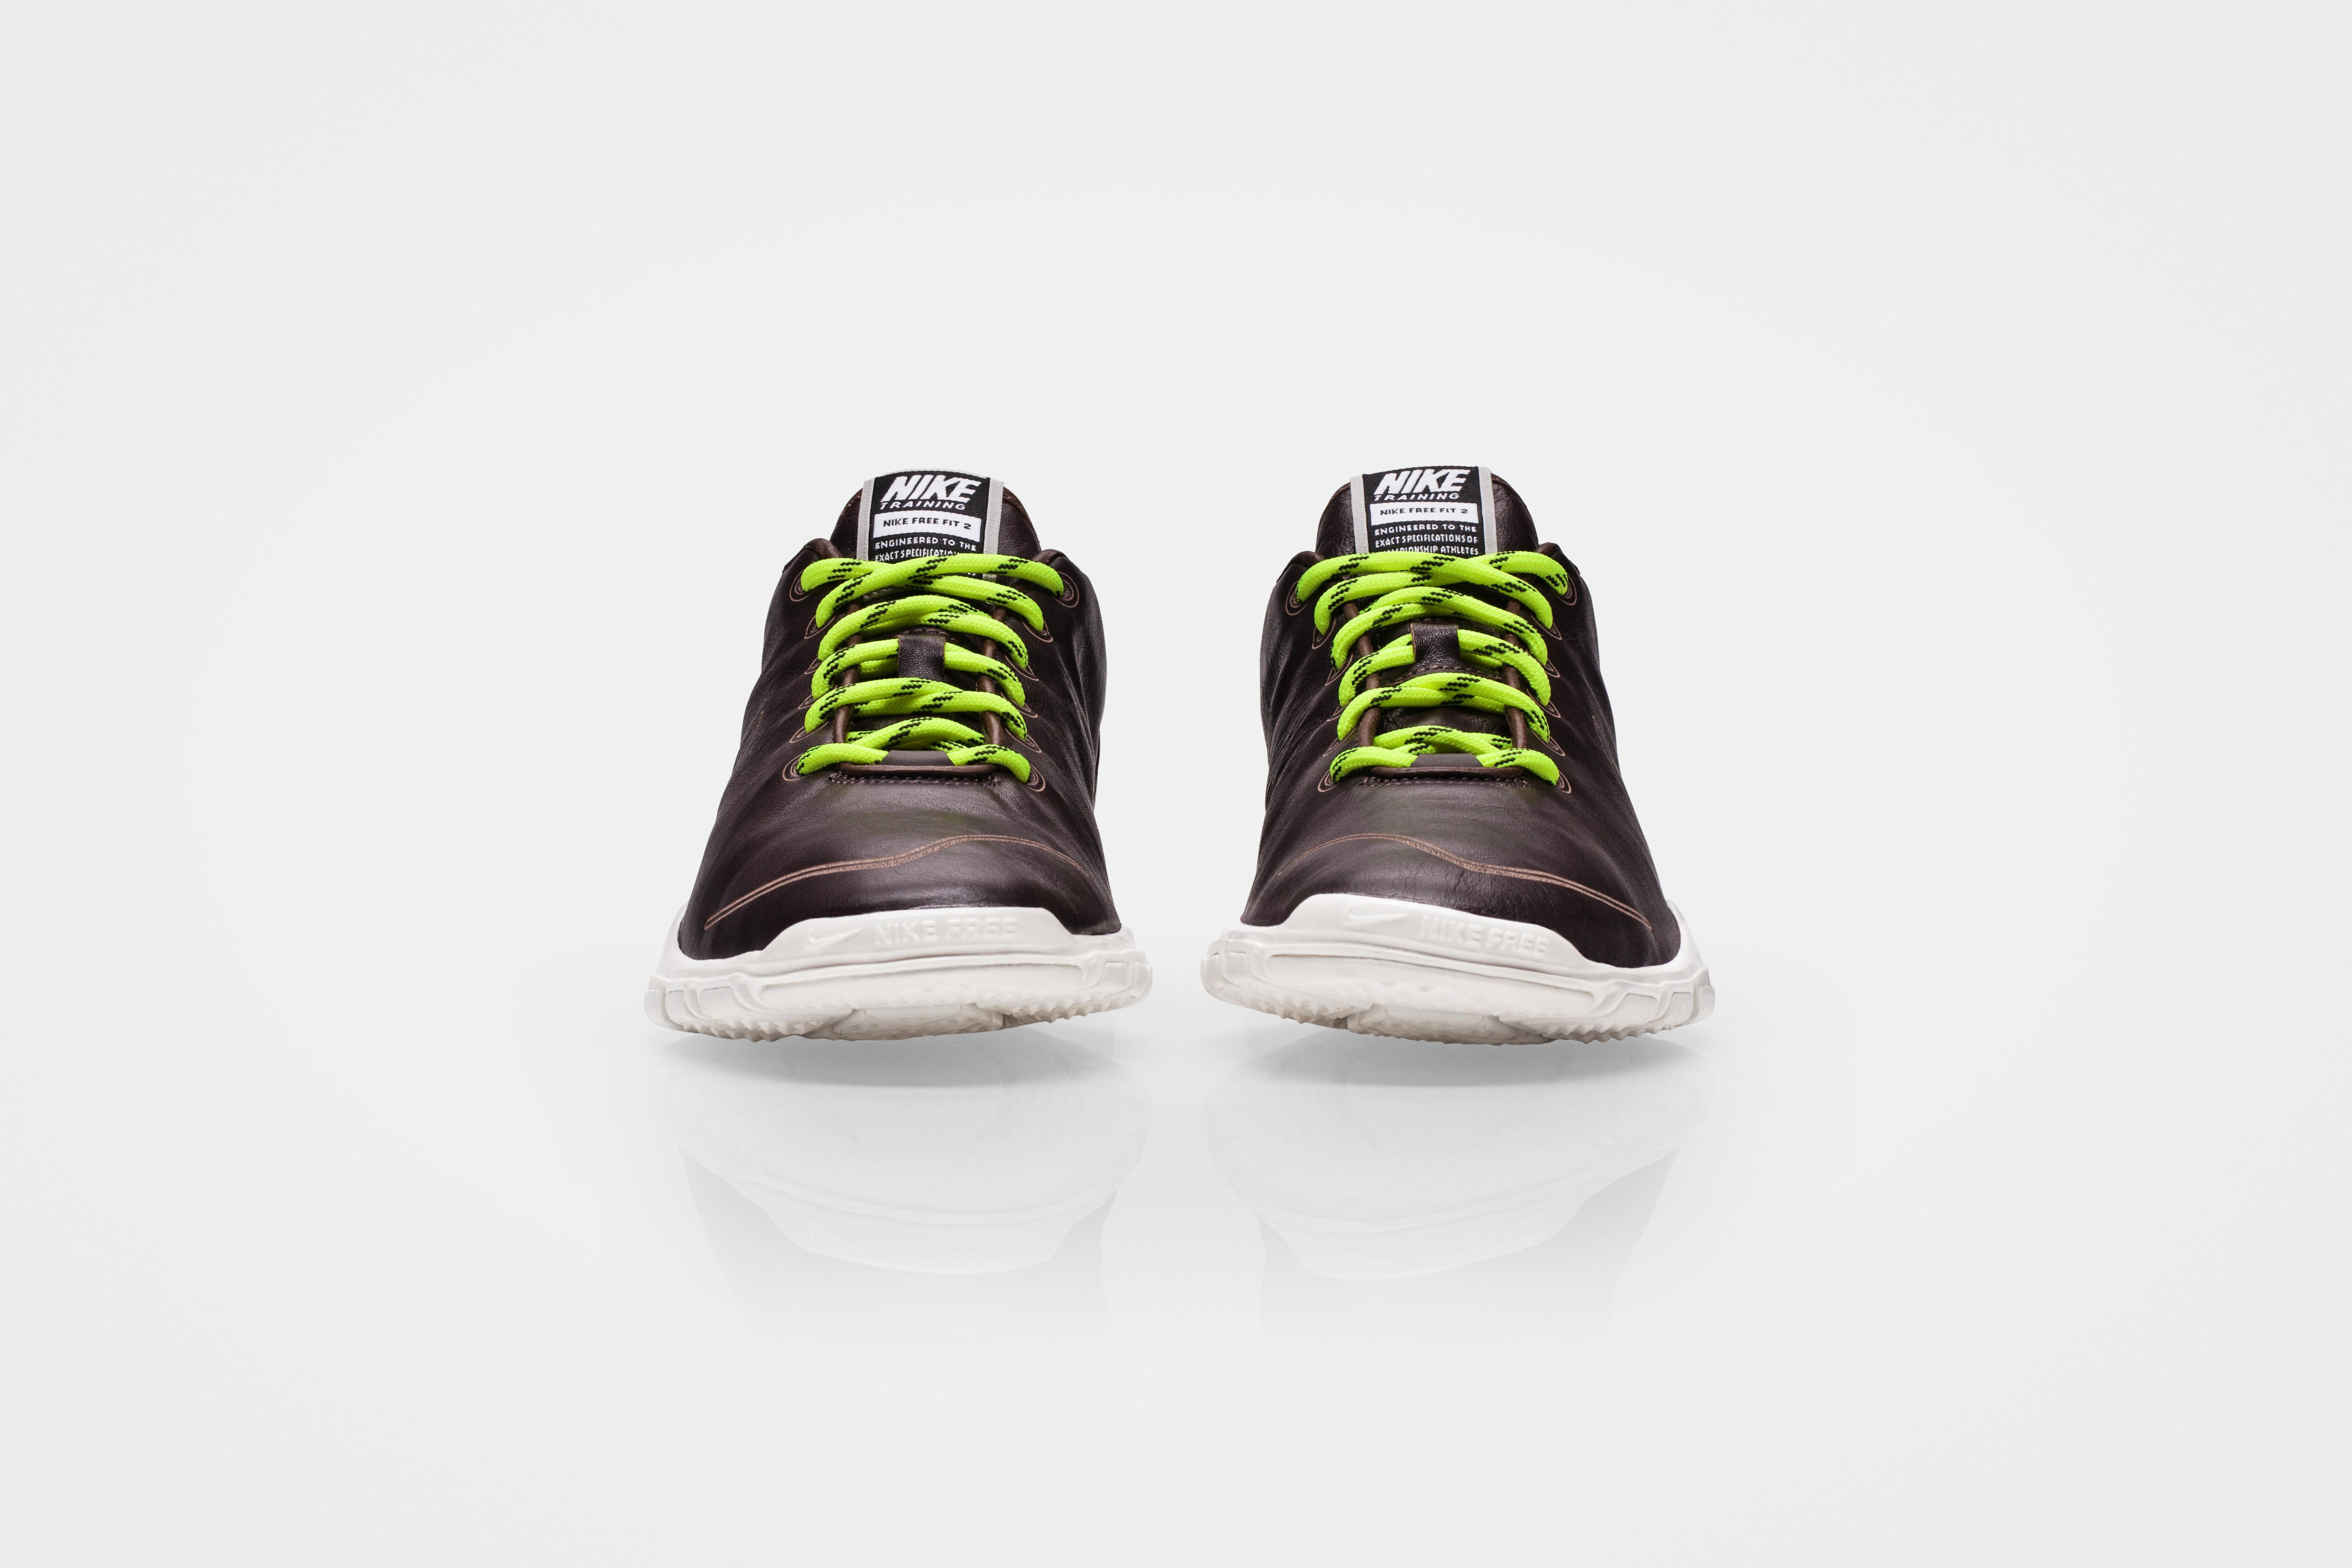 Virtually Stylish Basketball Shoes